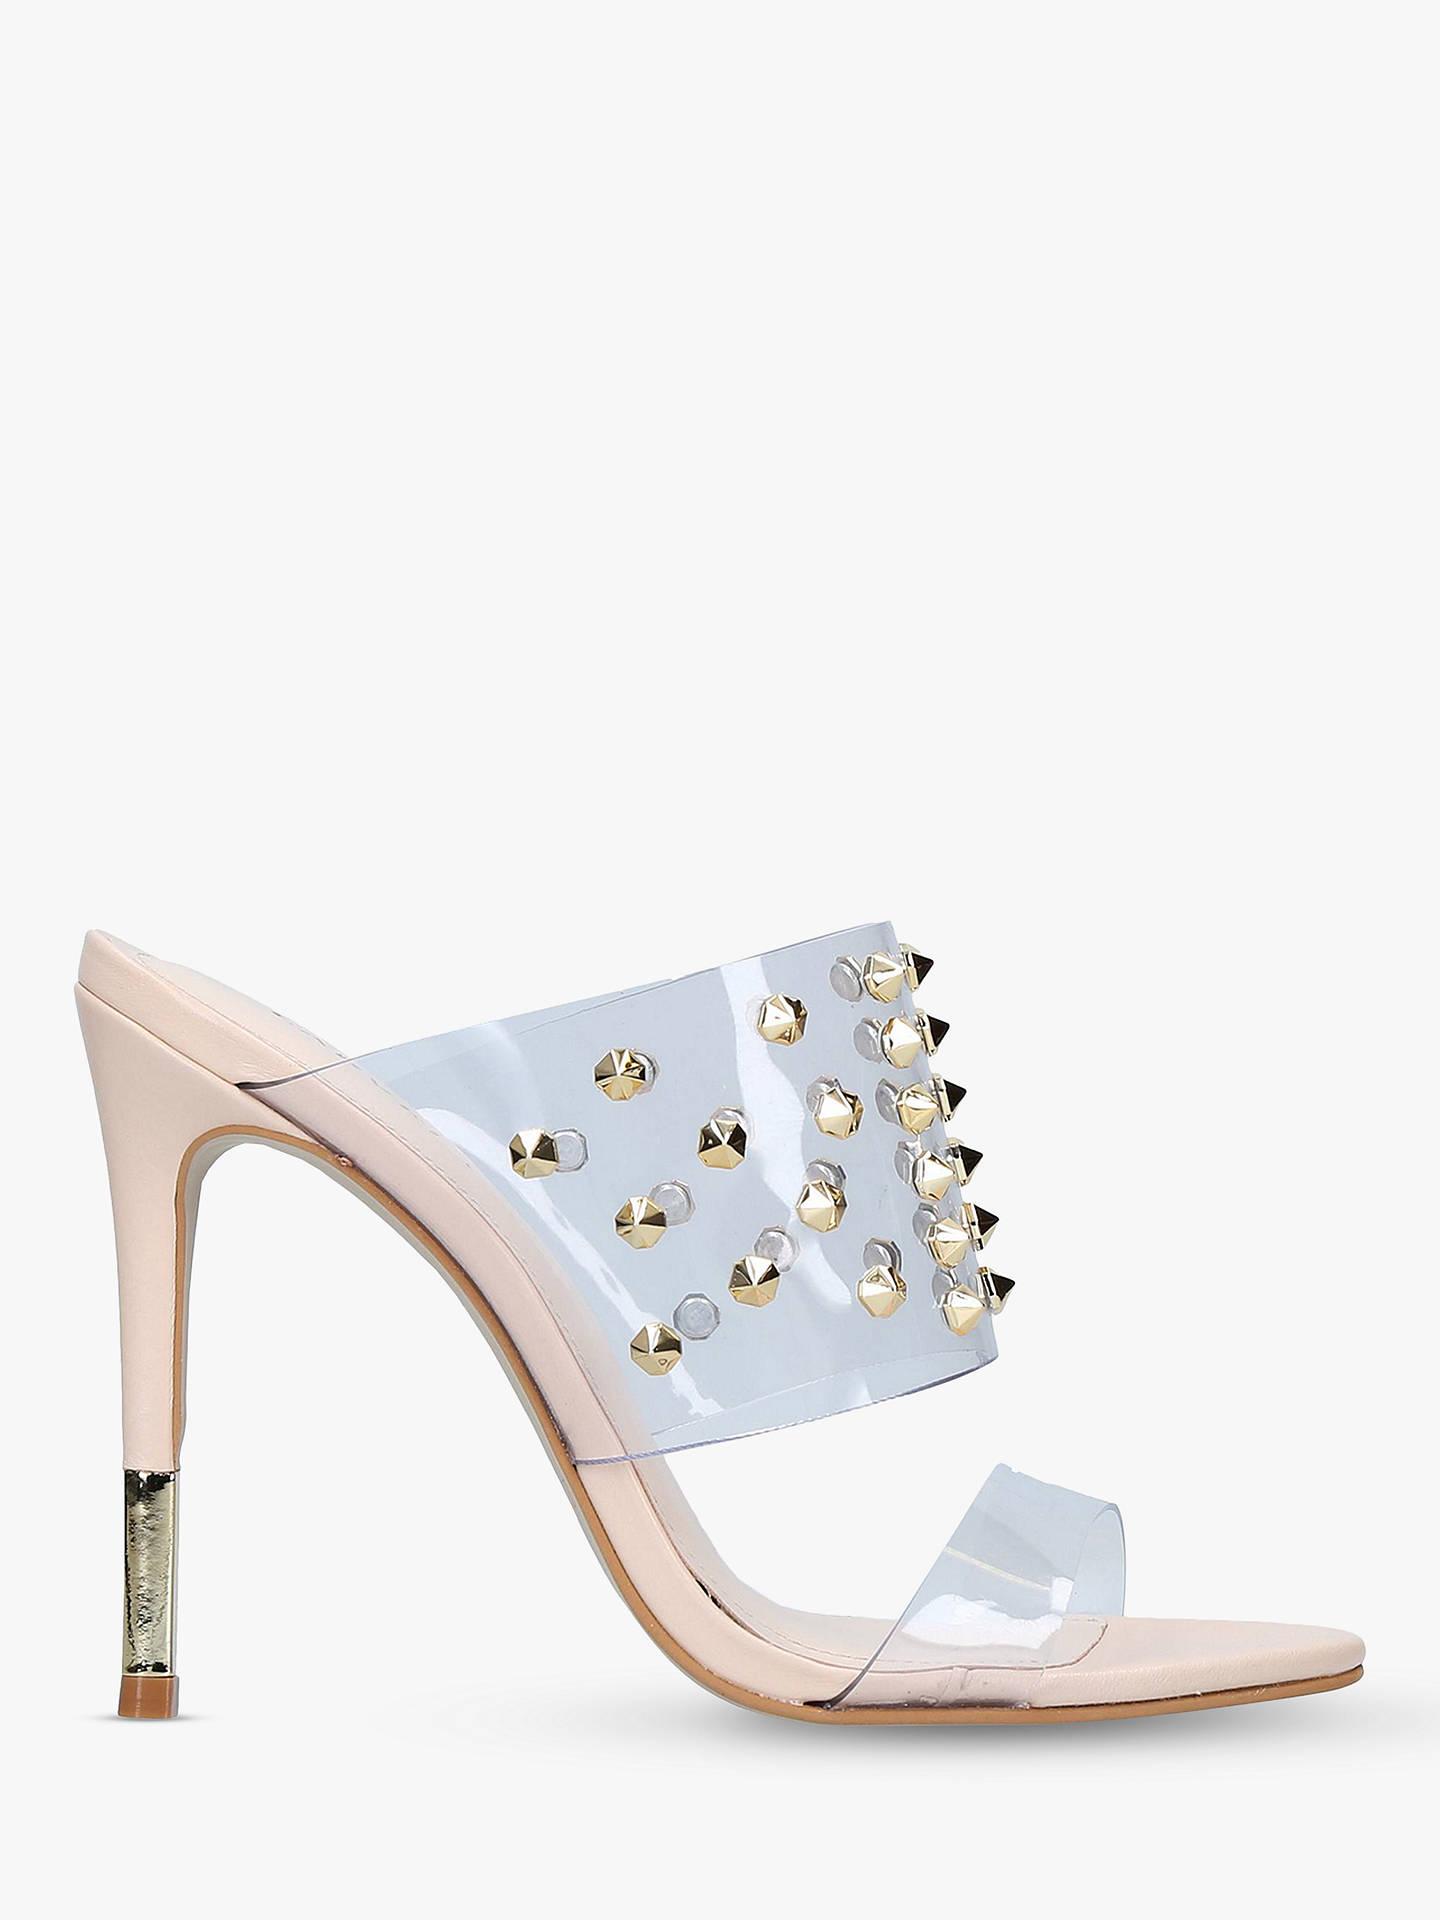 7bf08b0dd Buy Carvela Ghost Studded Stiletto Heel Sandals